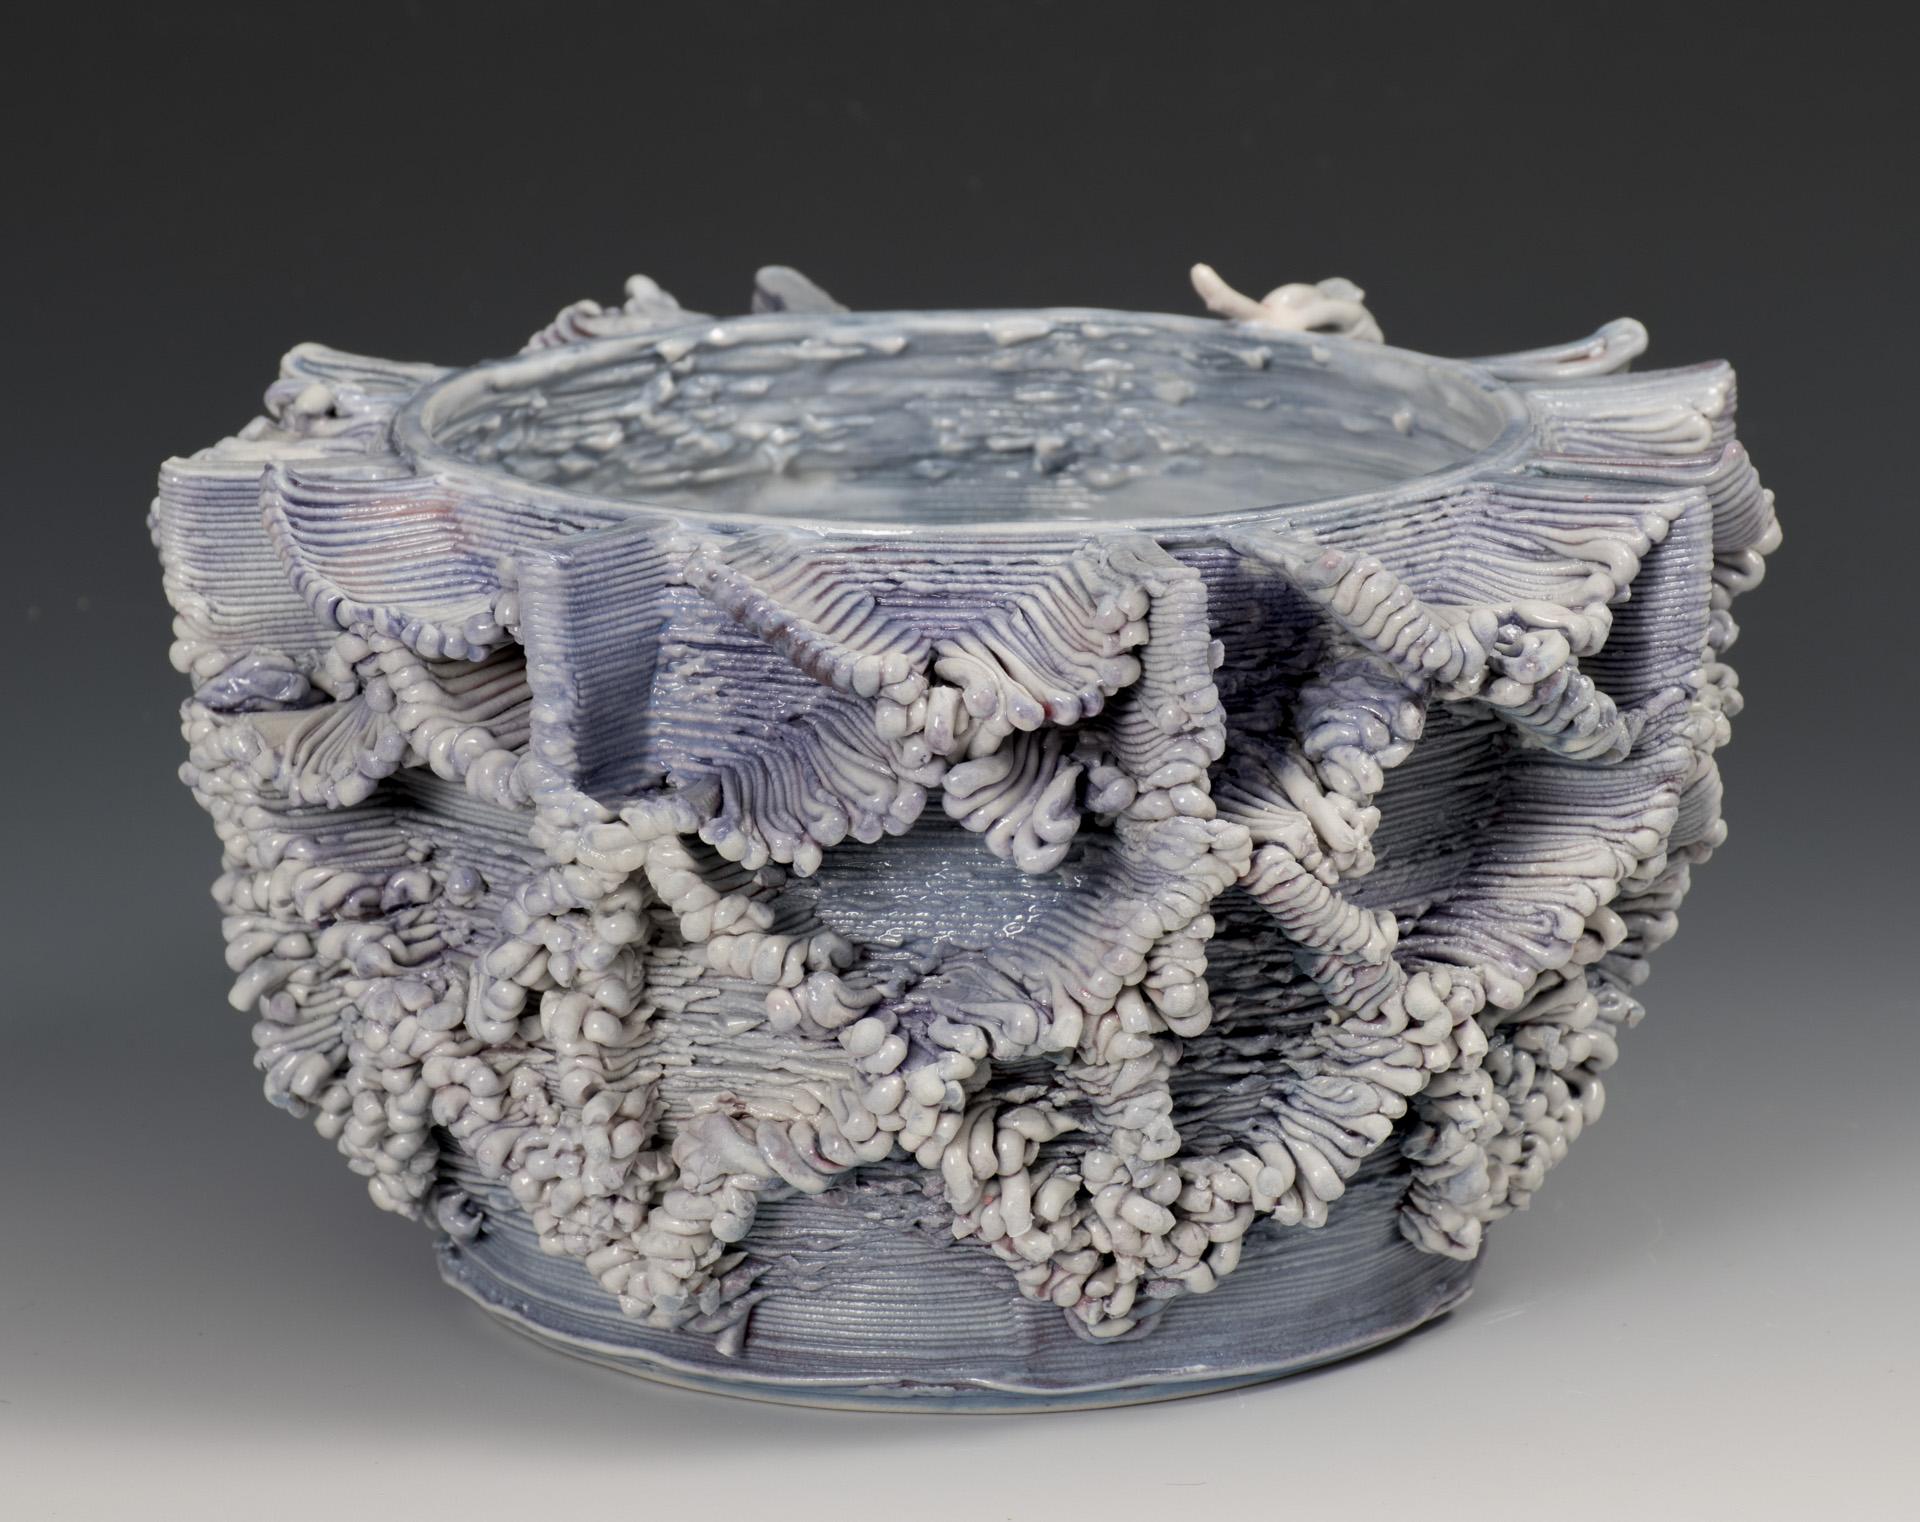 coral_bowl_lavender.JPG